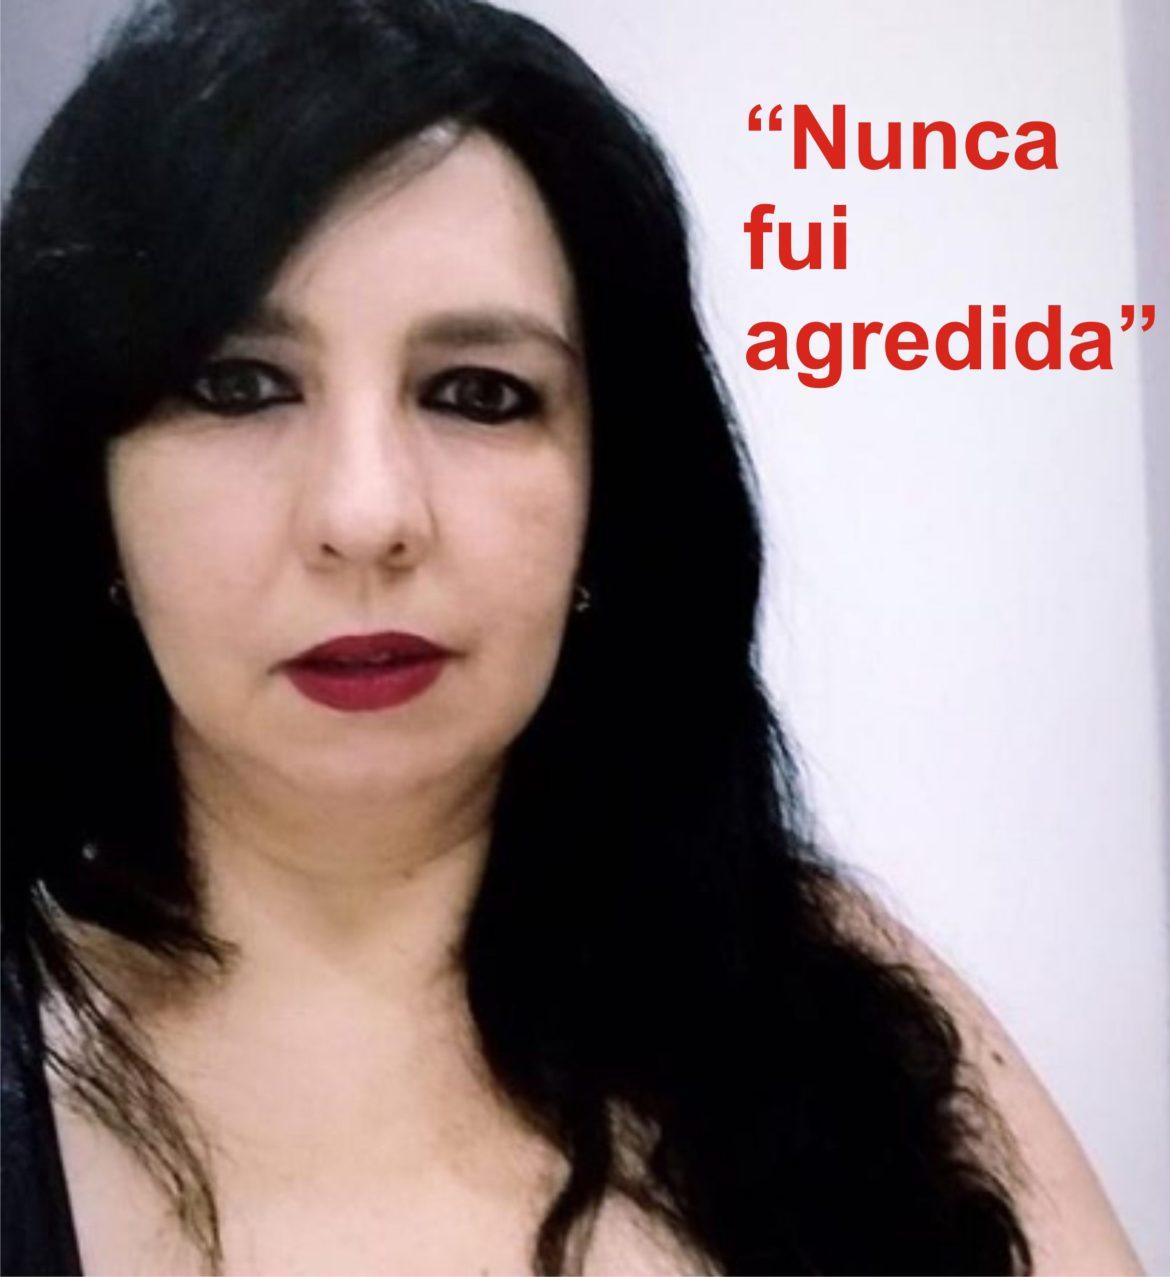 """Nunca fui agredida"". Afirma Fahima Nouri, ex-esposa de Helton Pessoa"